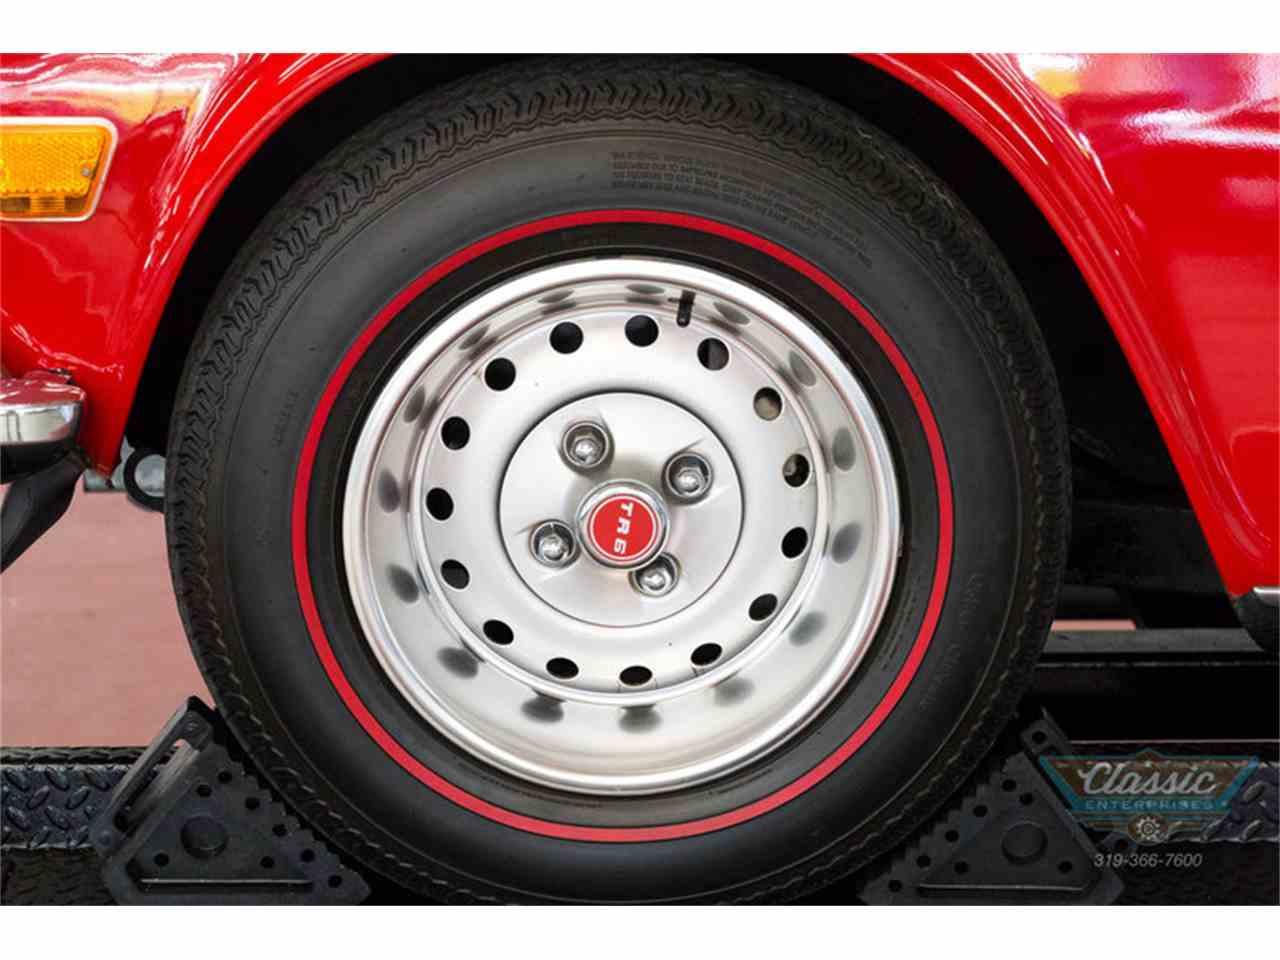 Large Picture of '73 TR6 located in Cedar Rapids Iowa - $20,950.00 - I82S